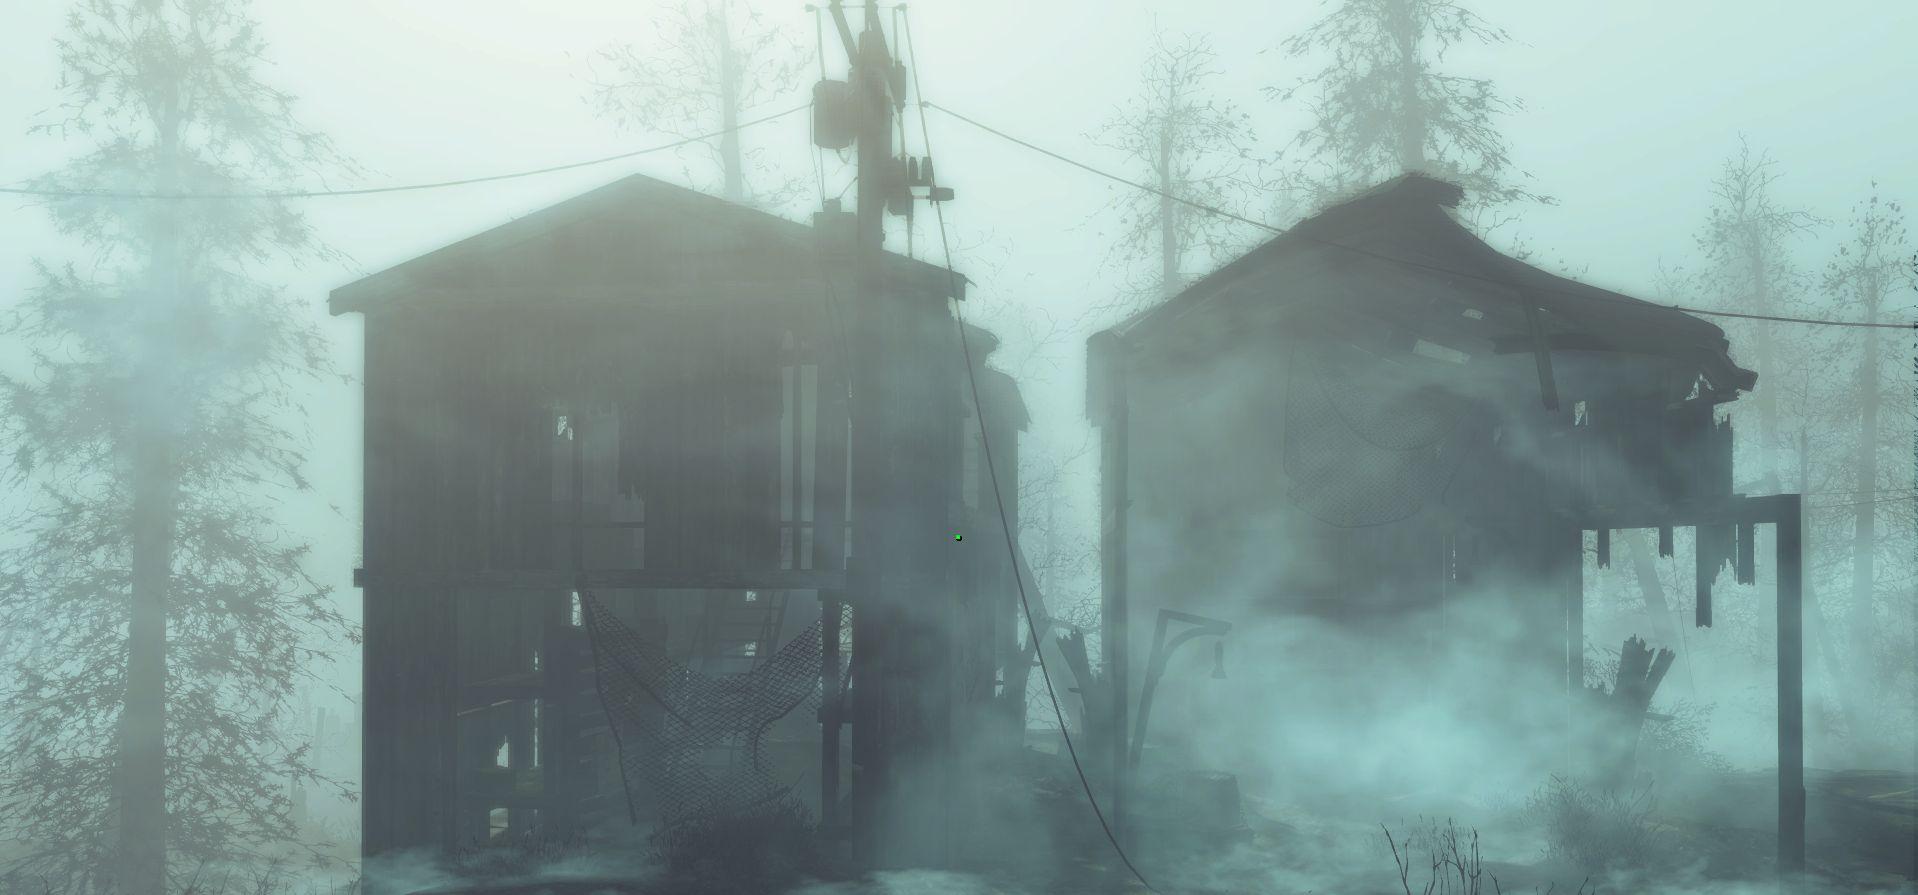 Fallout 4 Far Harbor: Finding a Hidden Area (Cranberry Island)